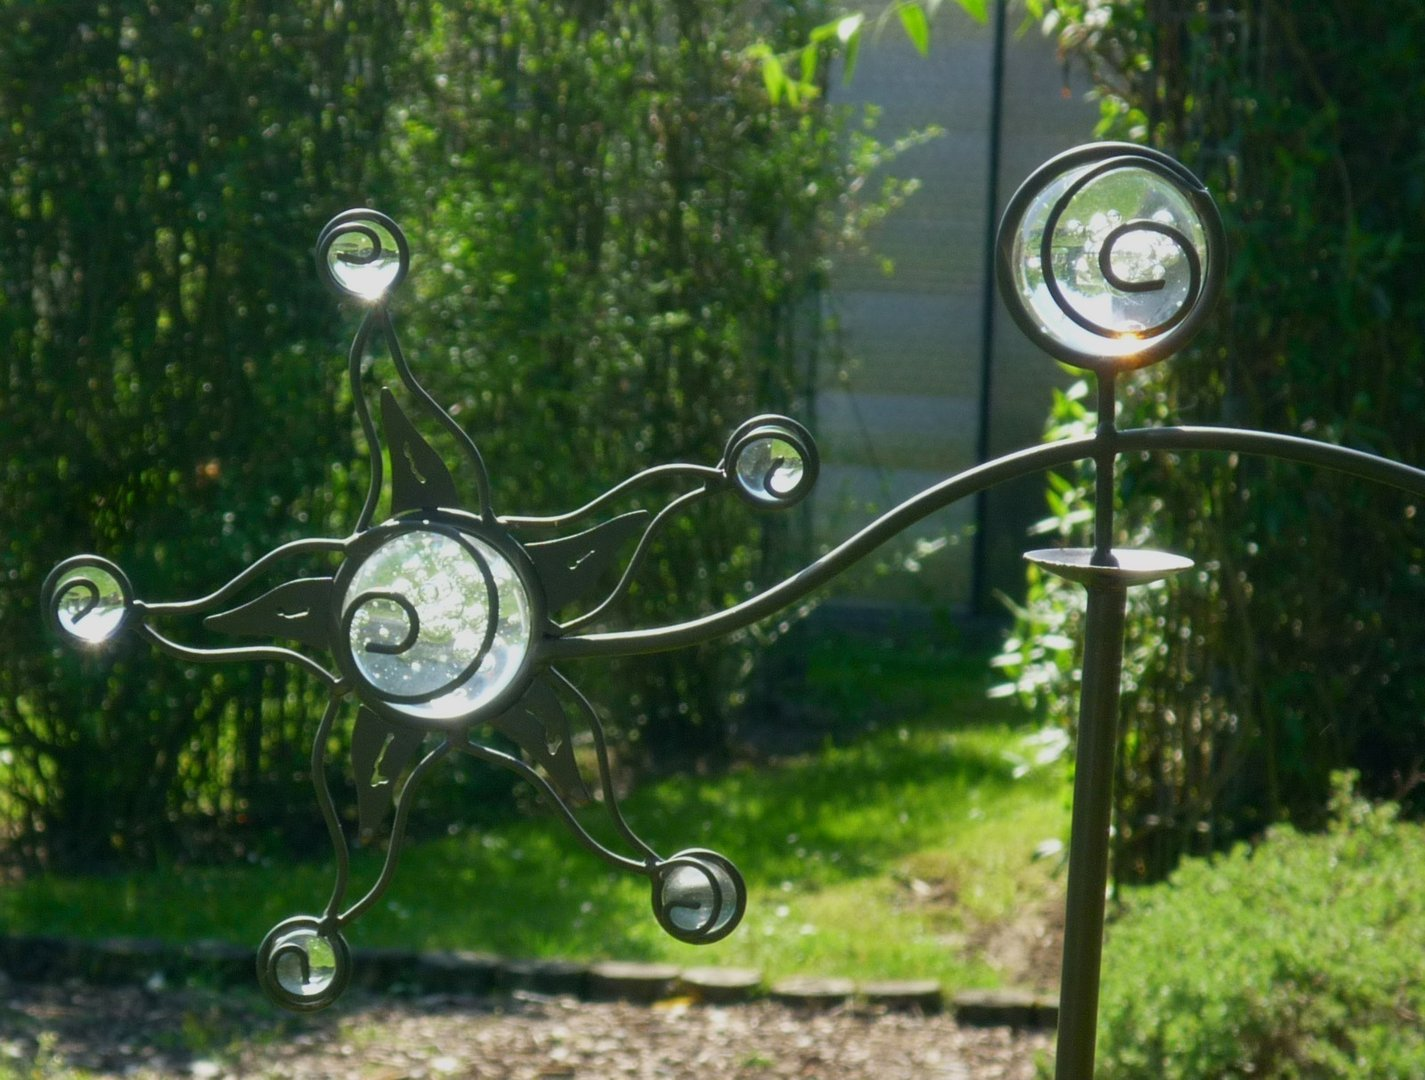 Windspiel wippe gartenstecker sonne garten m 8 glaskugeln for Windspiel edelstahl garten